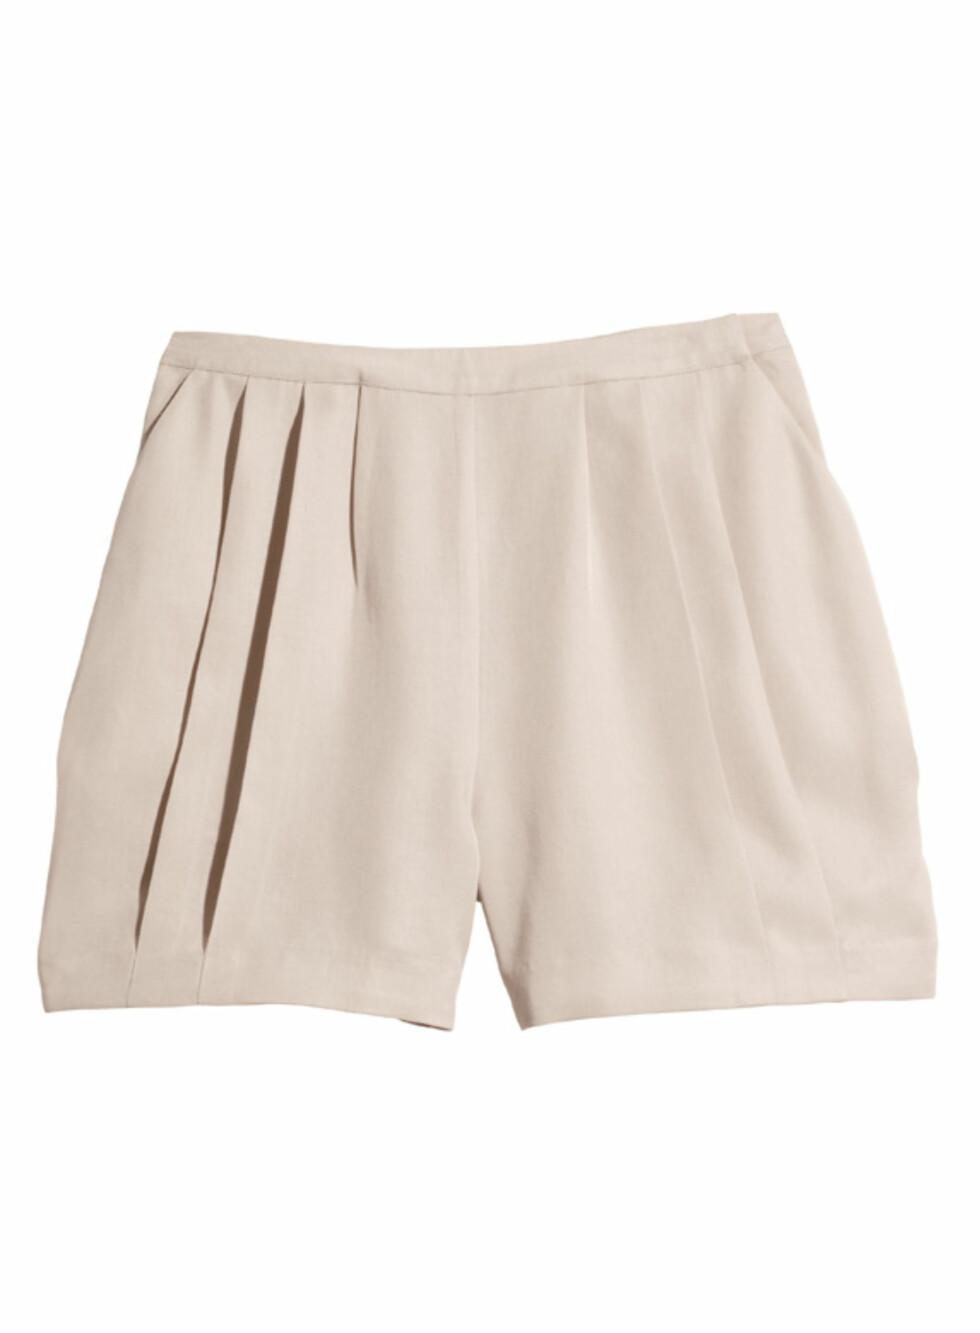 Pudderrosa shorts (kr.149). Foto: H&M